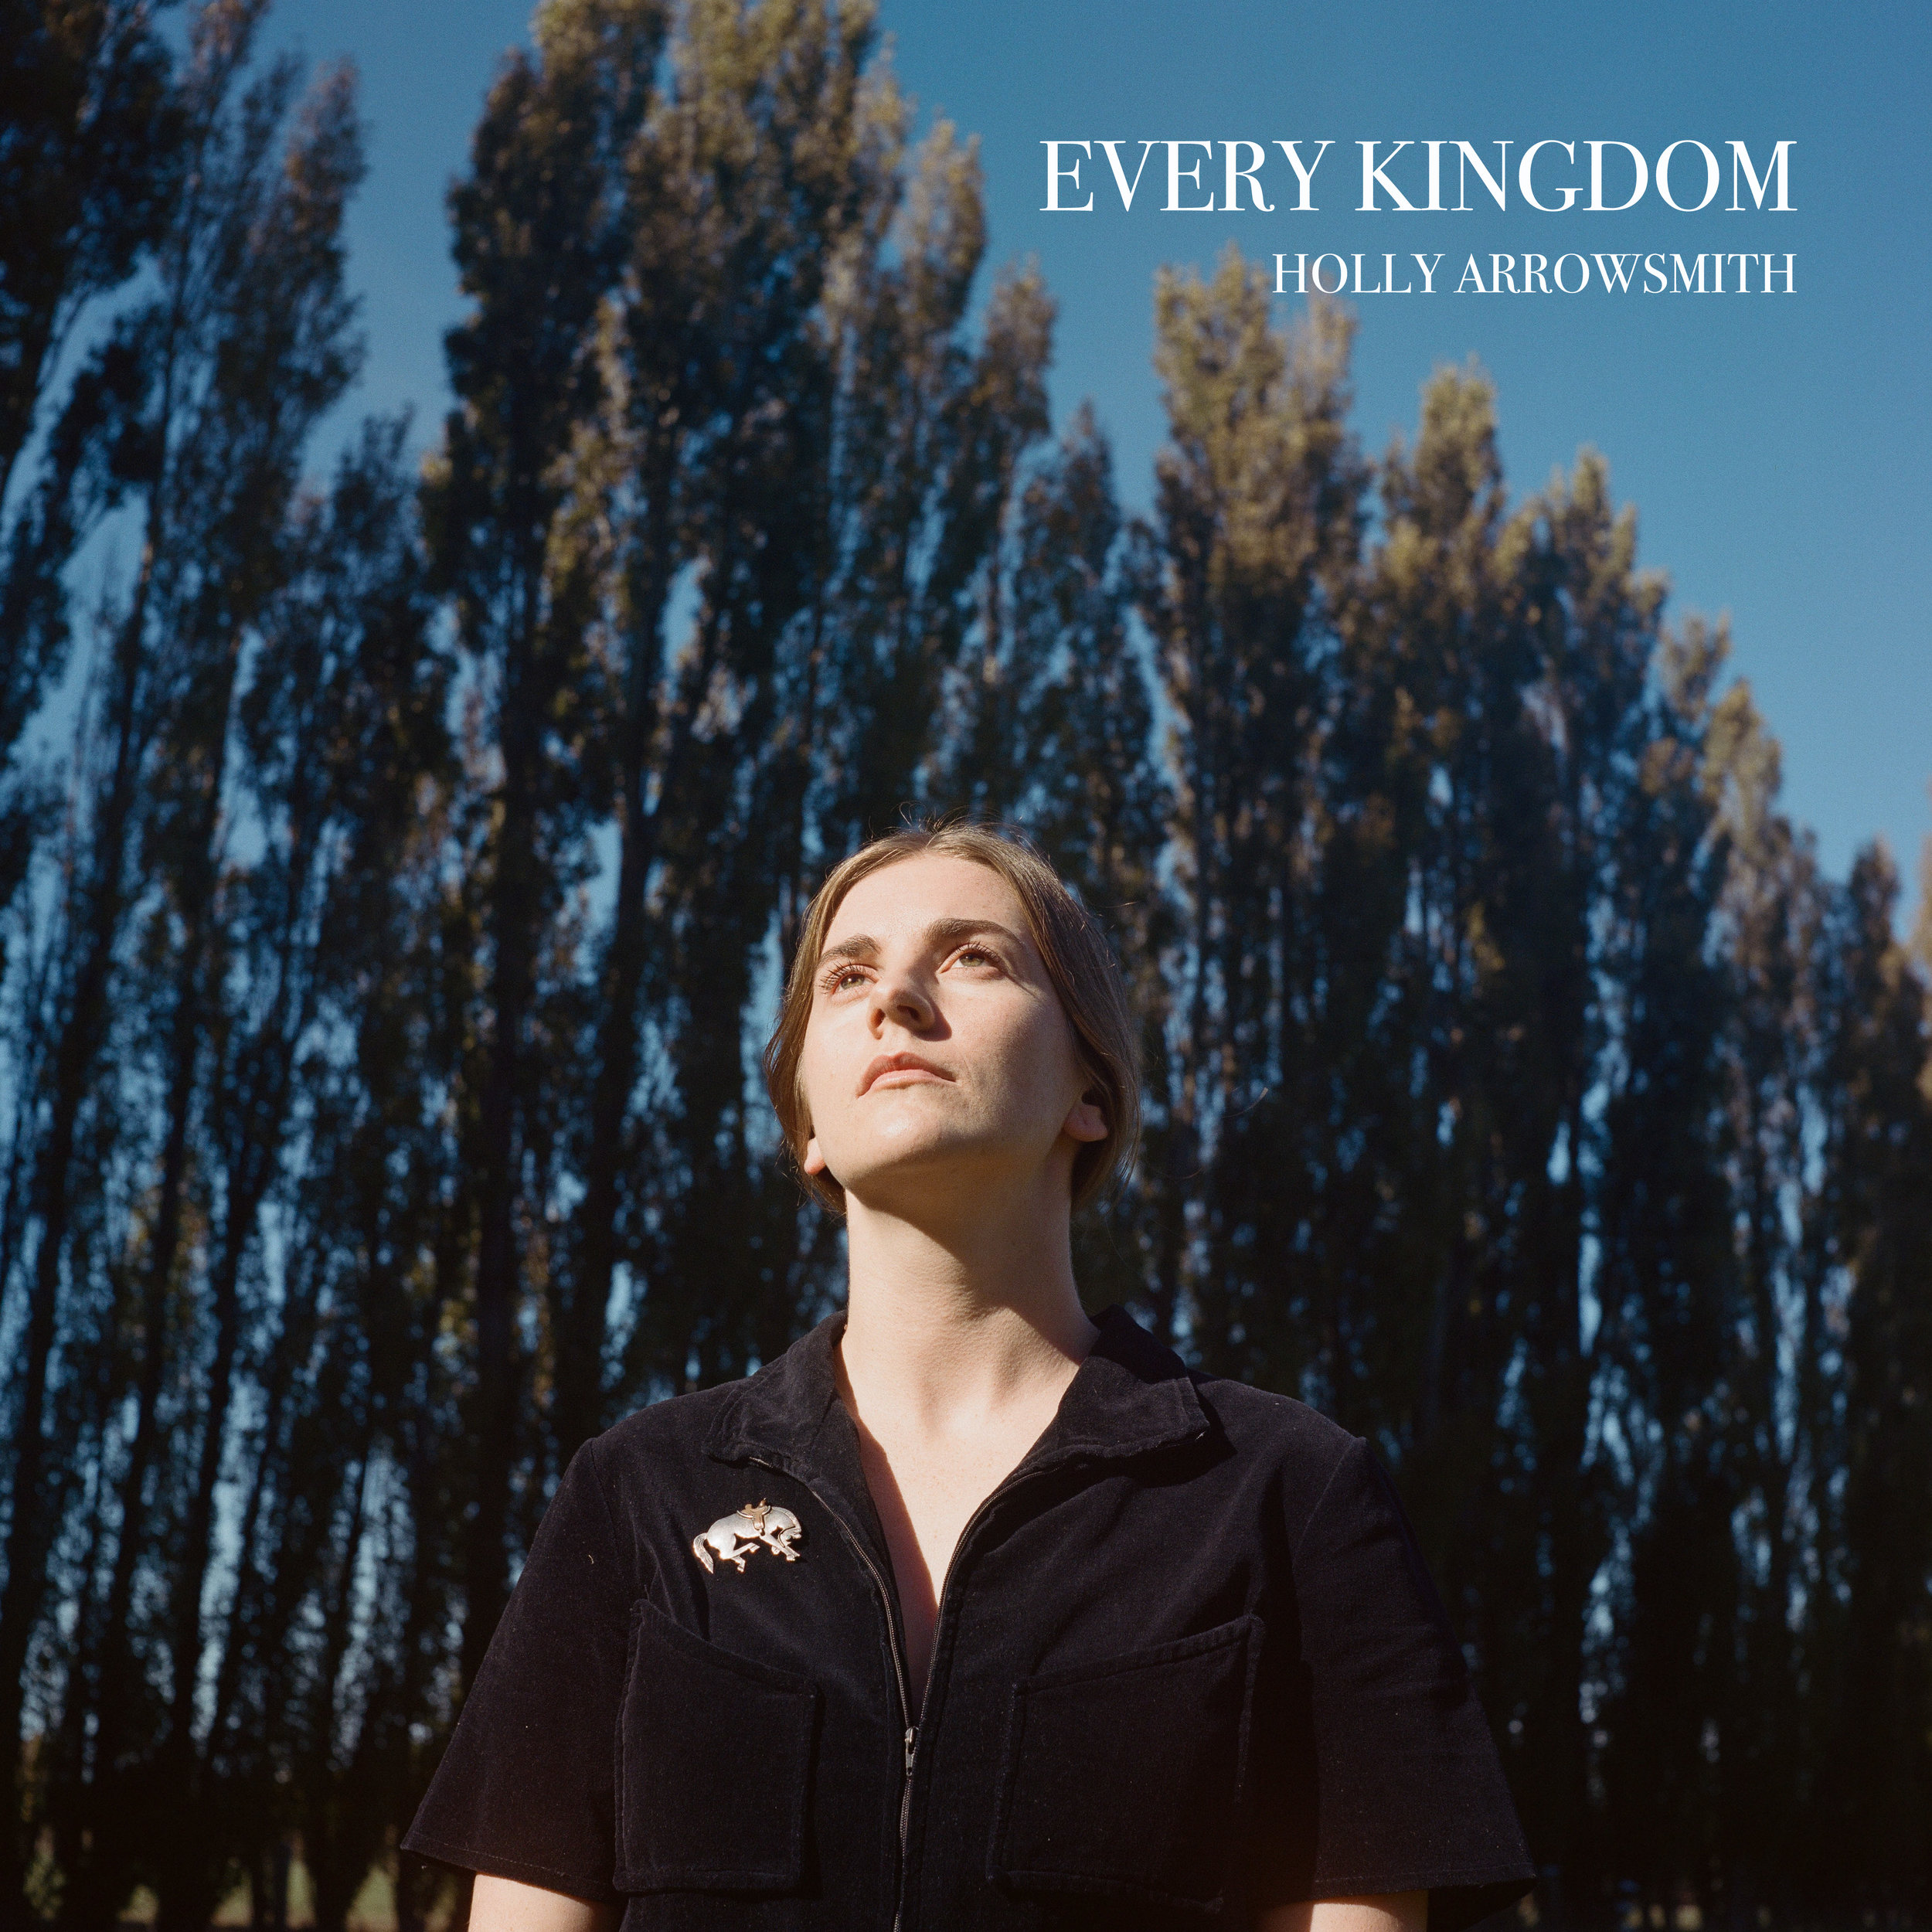 Every Kingdom Album Art-01.jpg